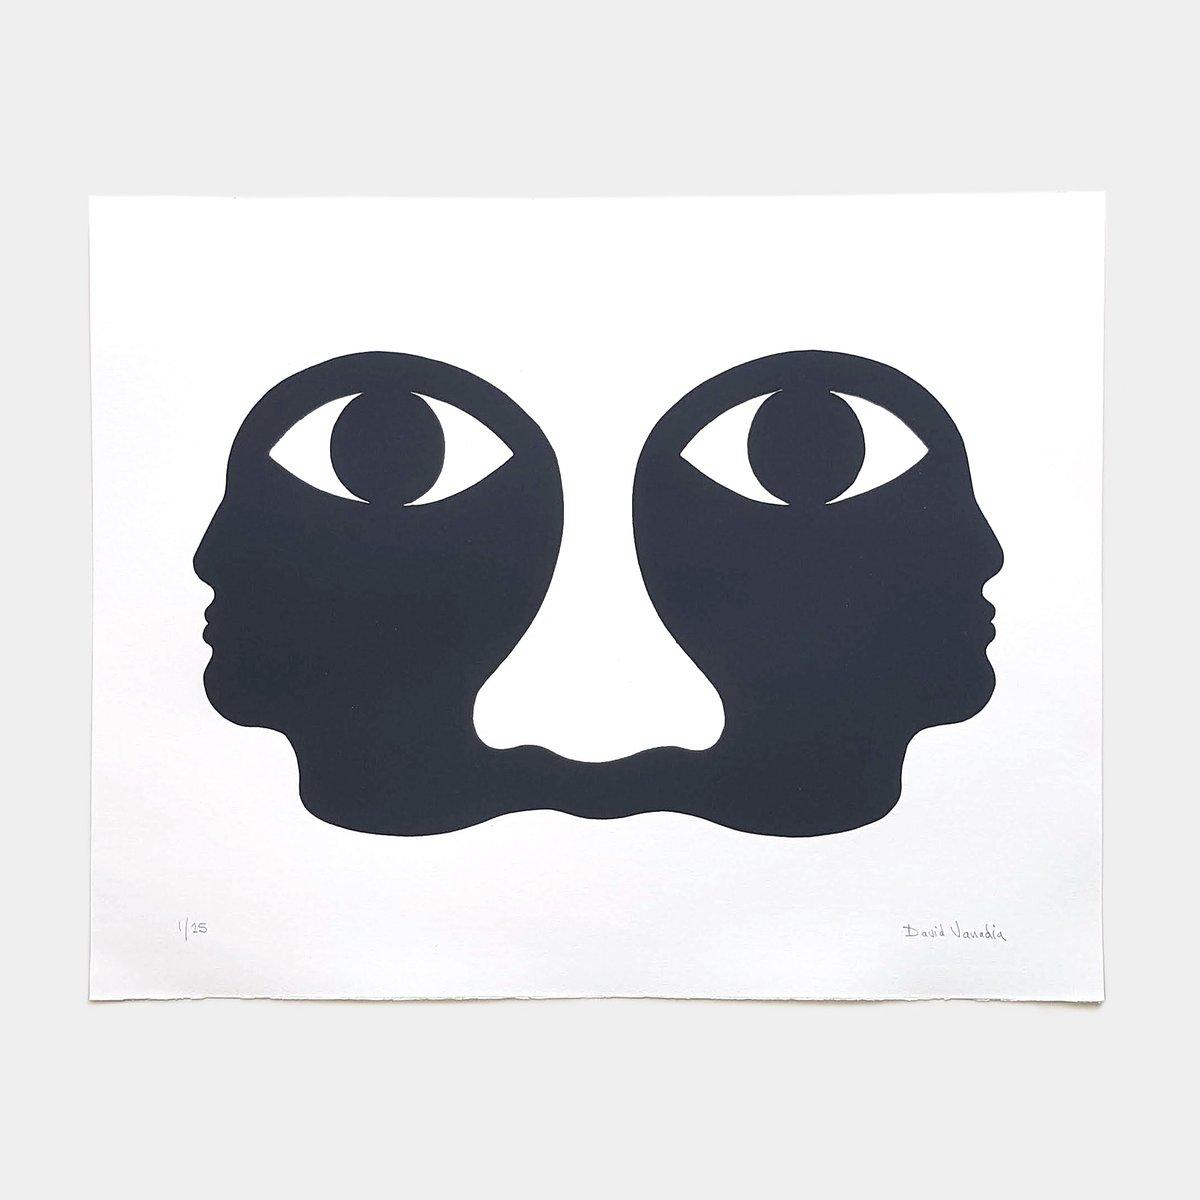 Image of Limited edition linocut print 50 x 40 cm 'Vision Commune'